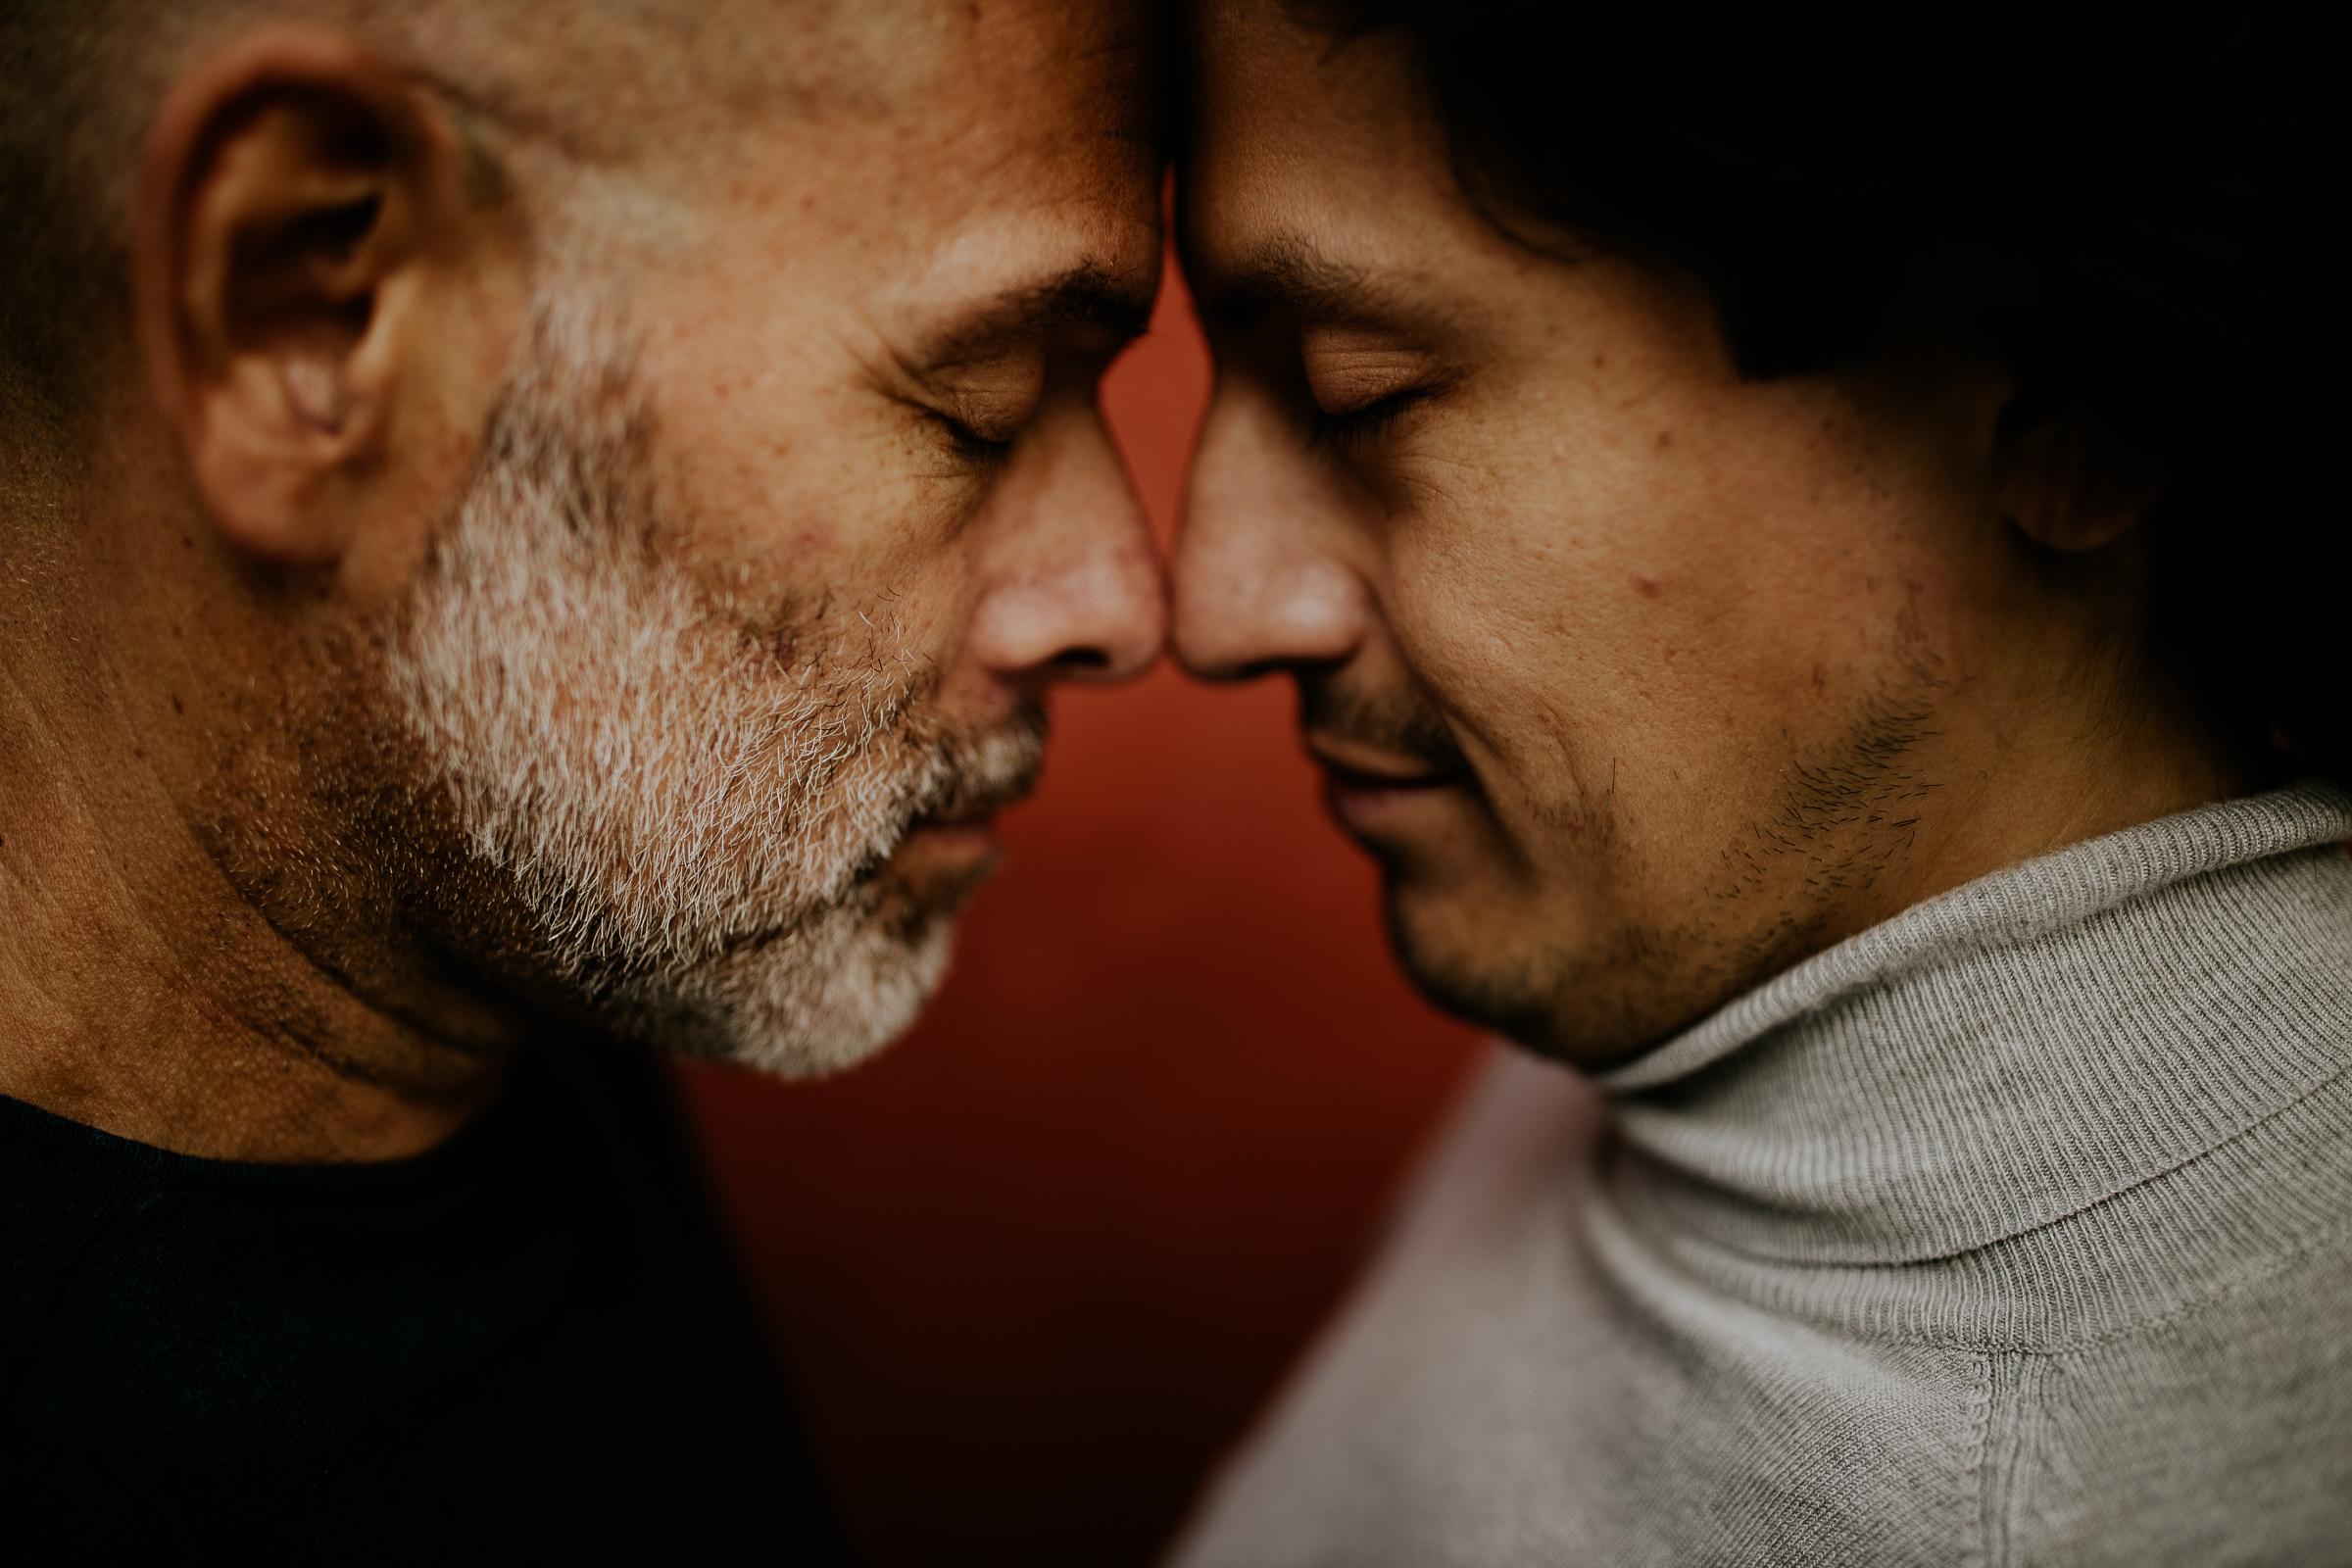 two men eyes closed